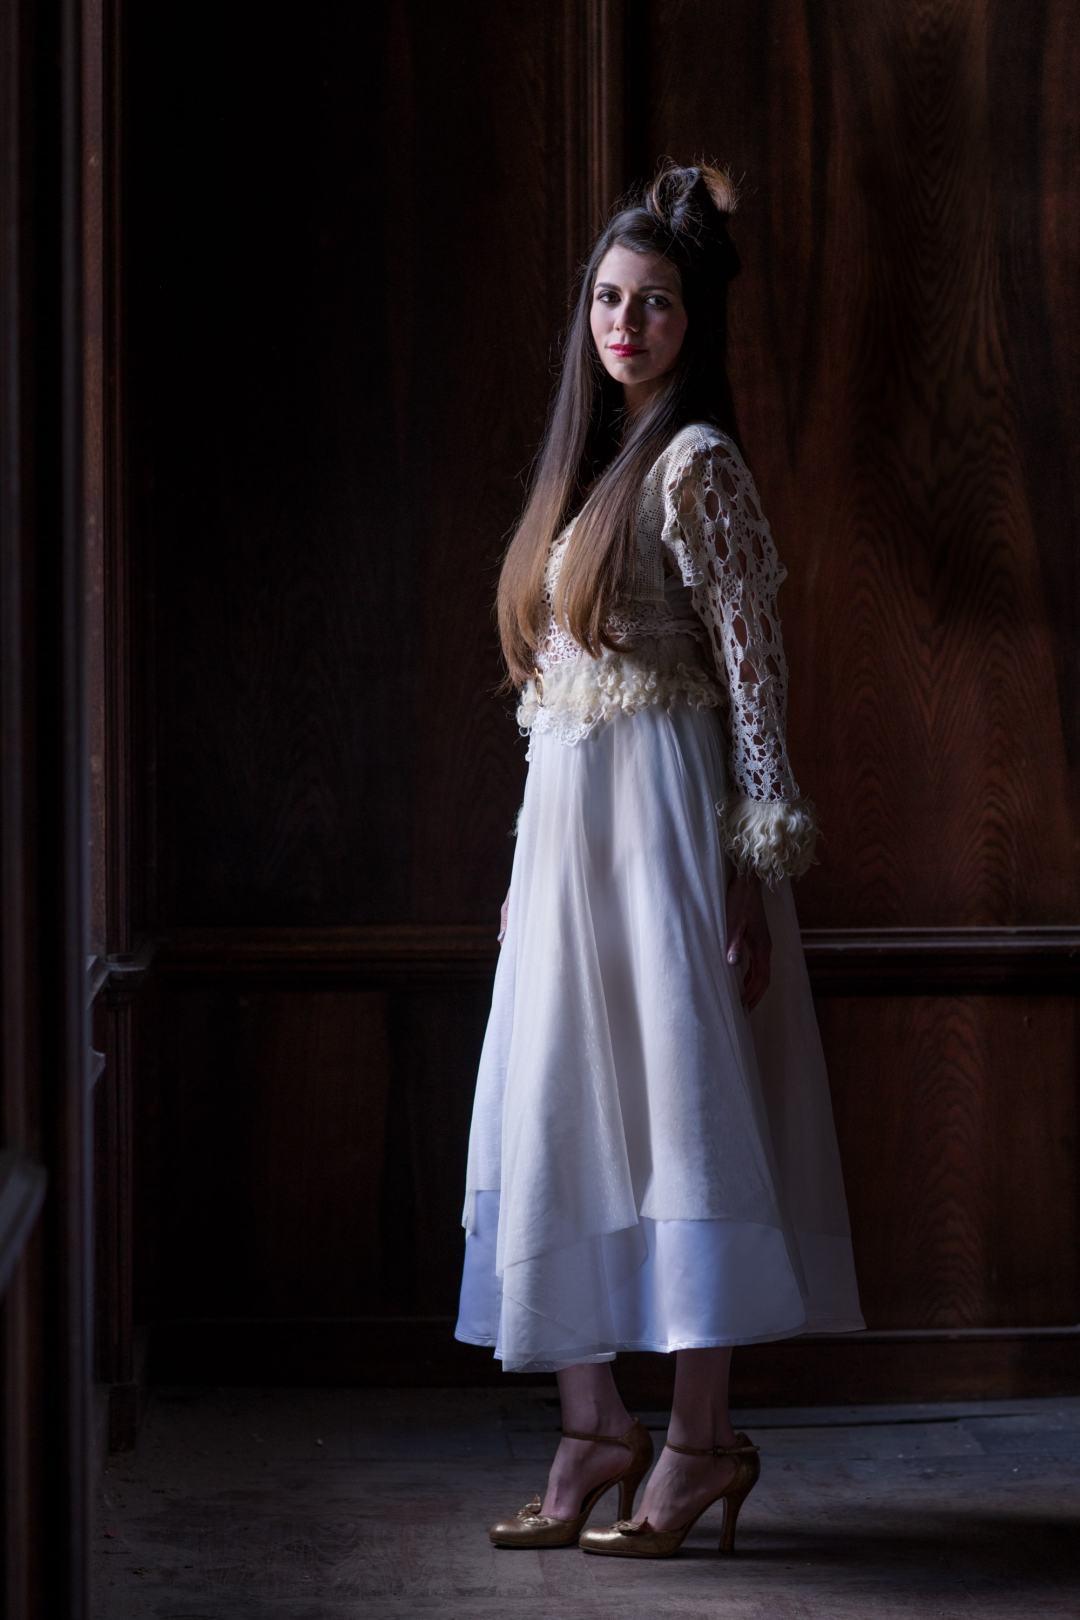 3000DSC 8545 Edit 1 1 - Dark and Moody Wedding Photography Shoot, Hudson Valley